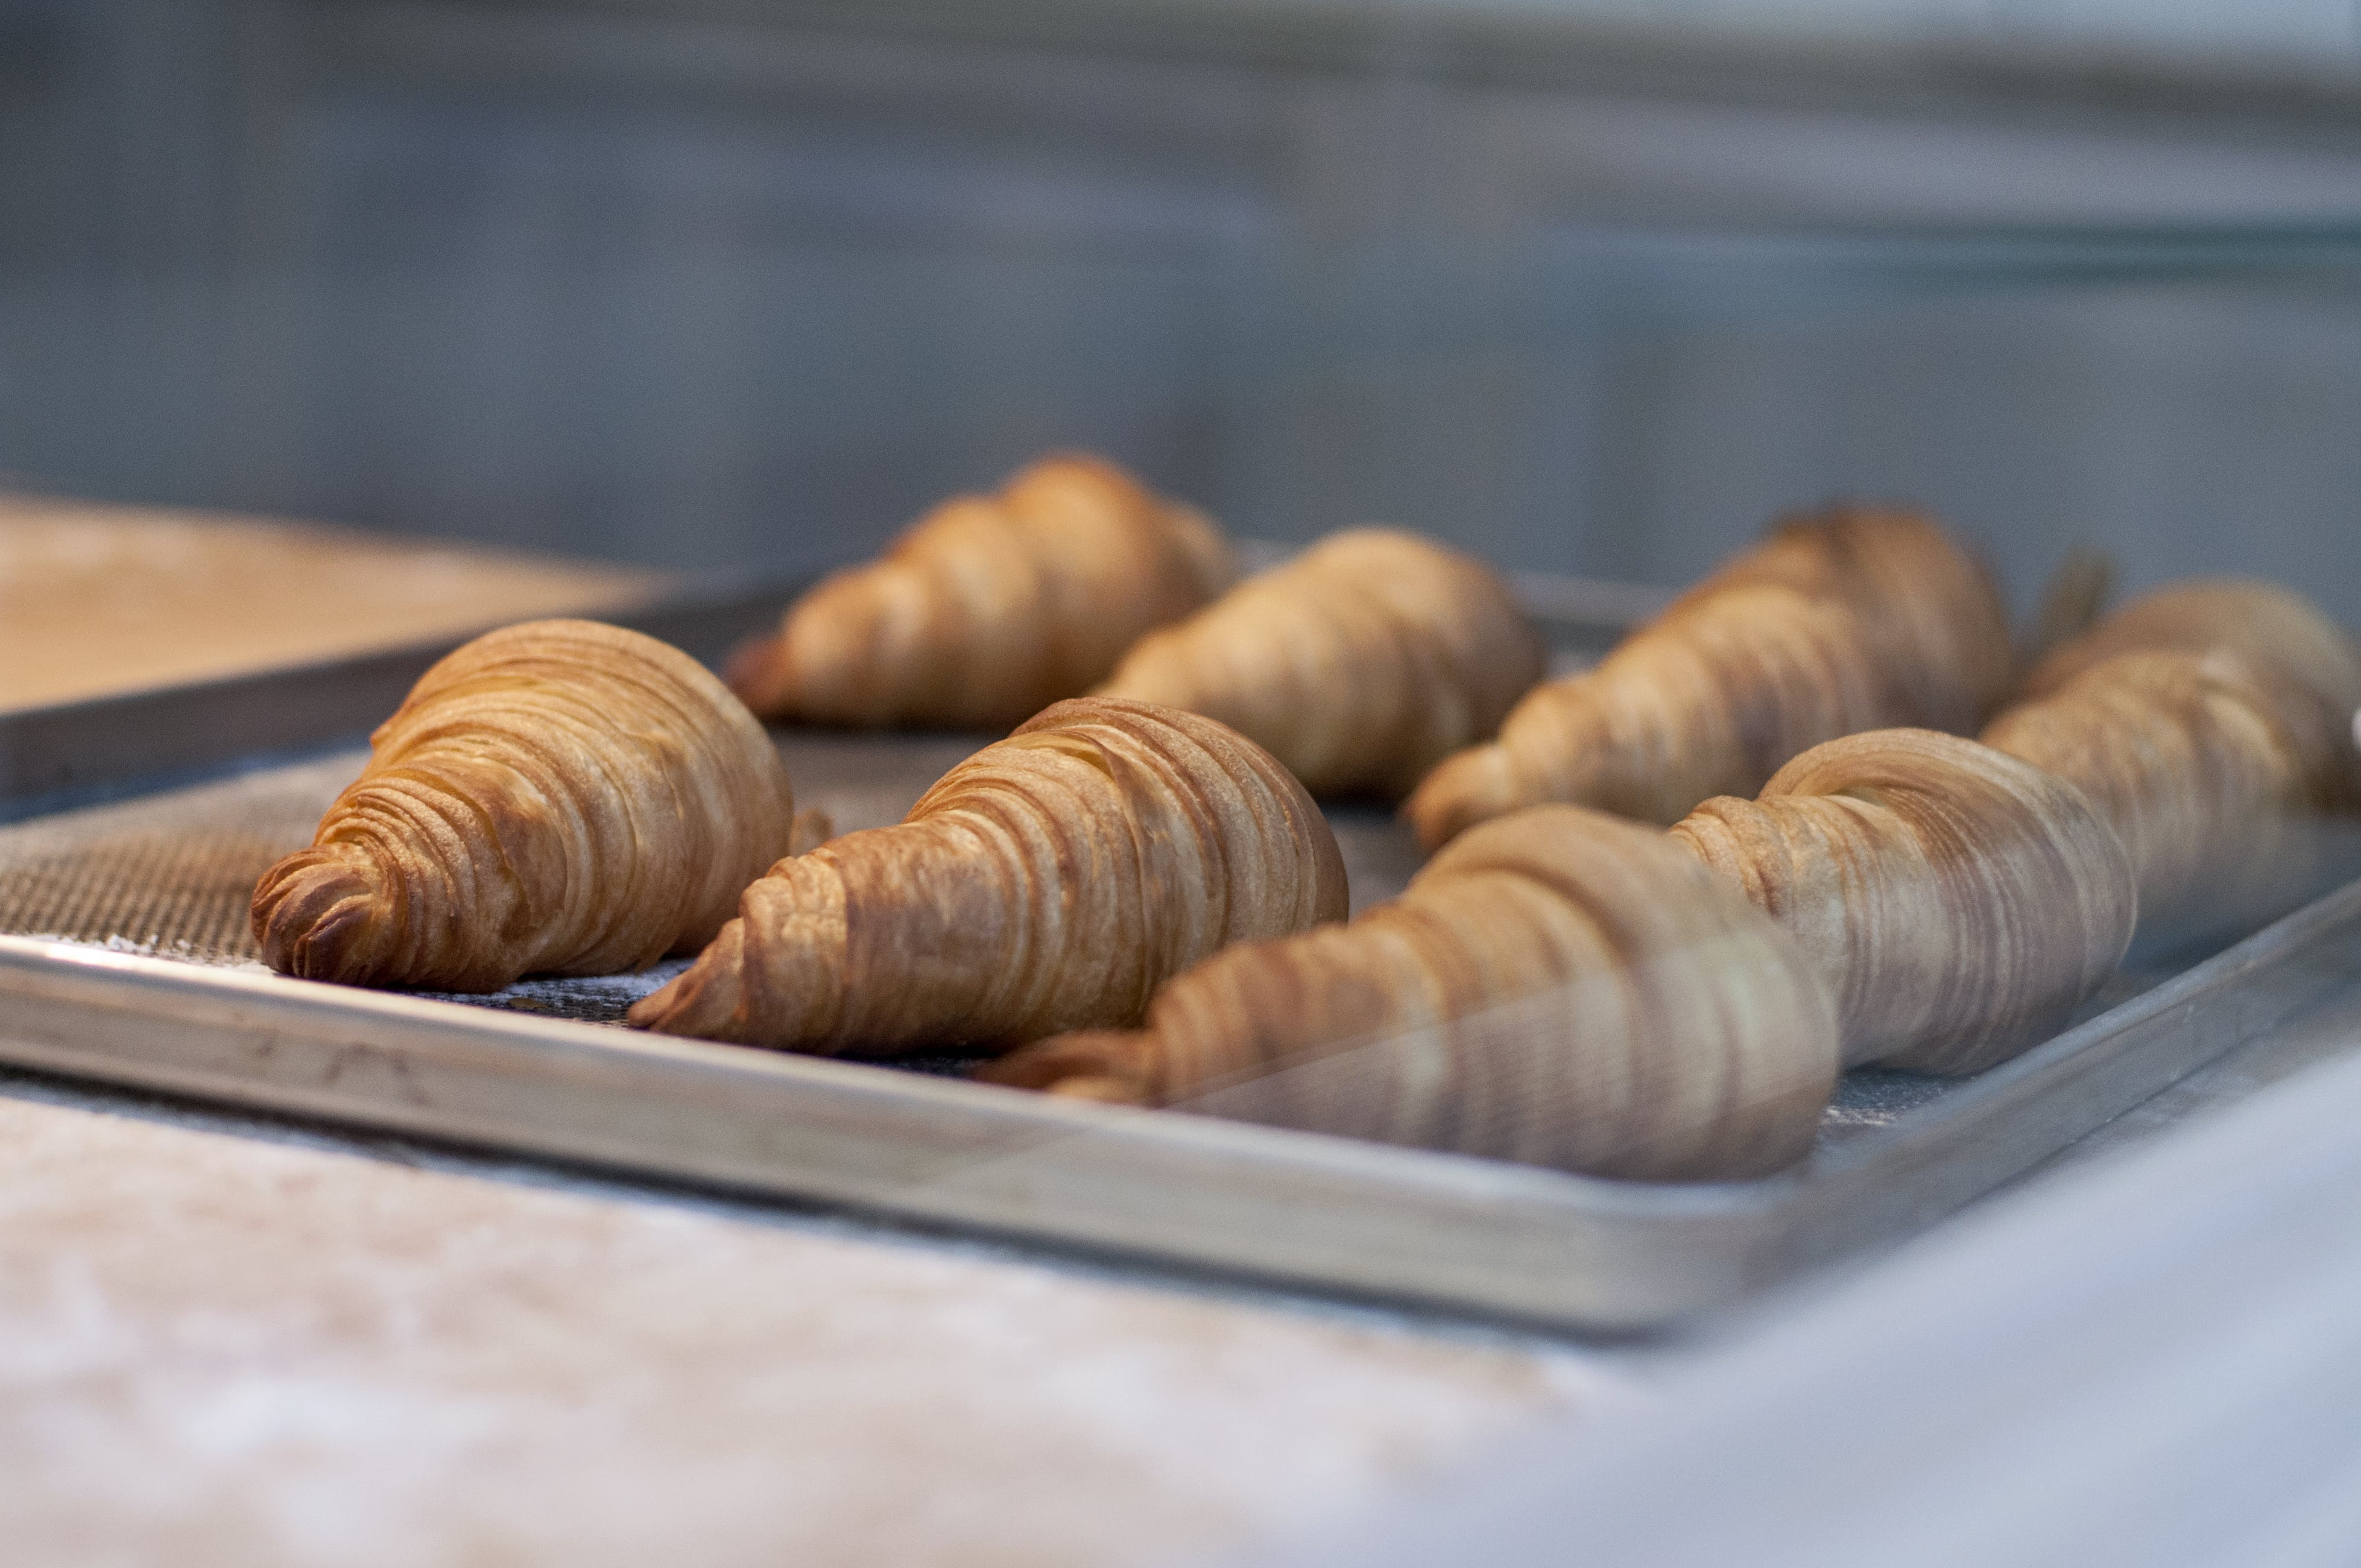 bakery, breakfast, croissants